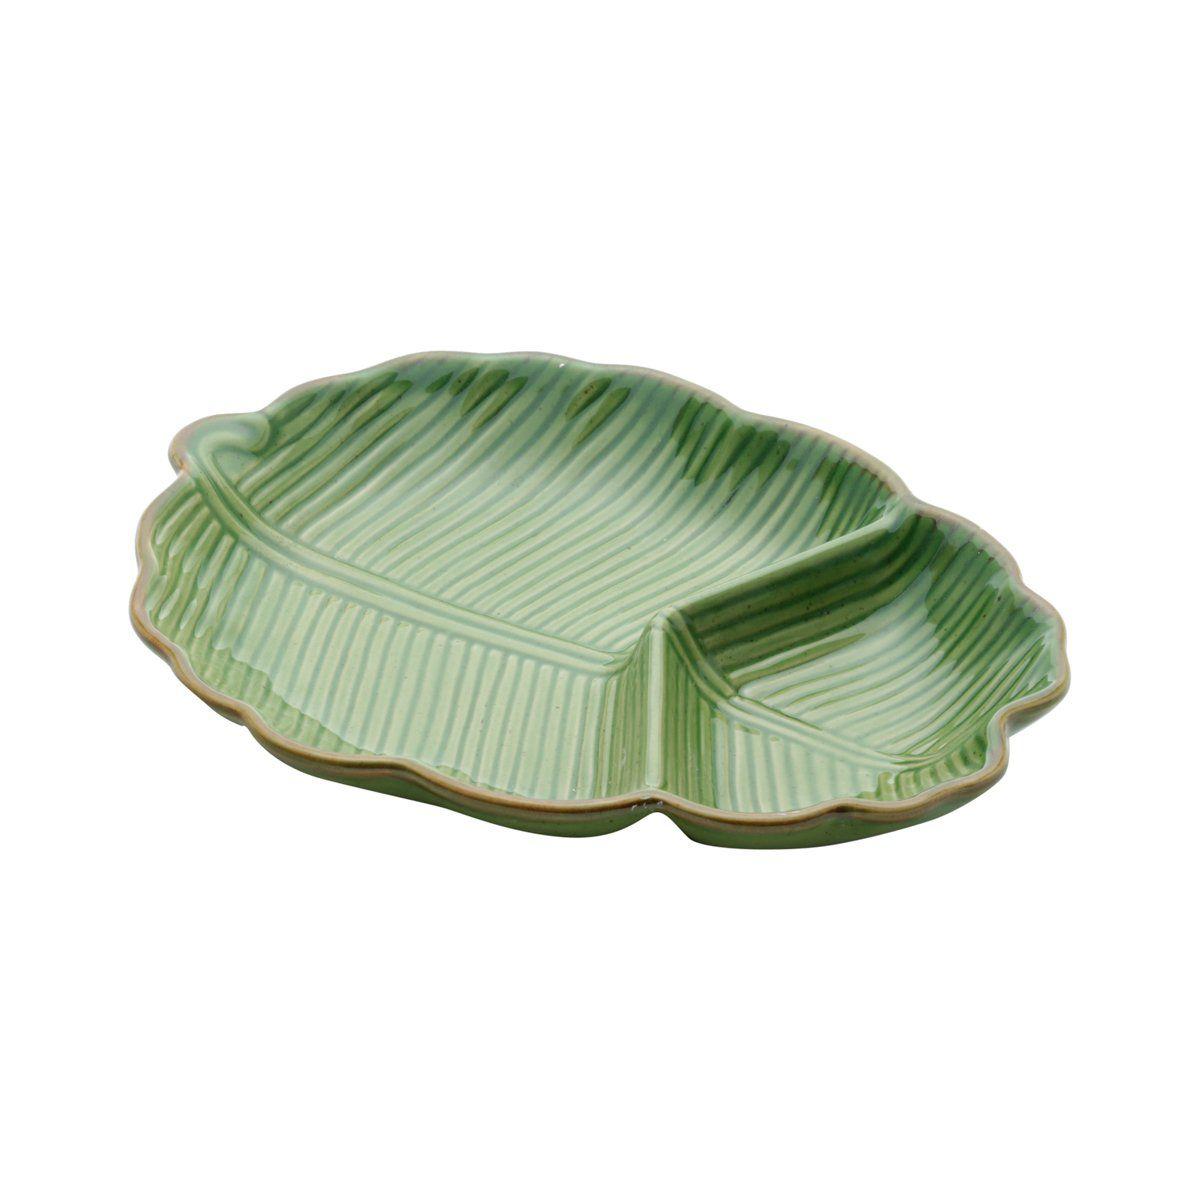 Prato decorativo 25,5 x 16 cm de cerâmica verde Banana Leaf Lyor - L4125